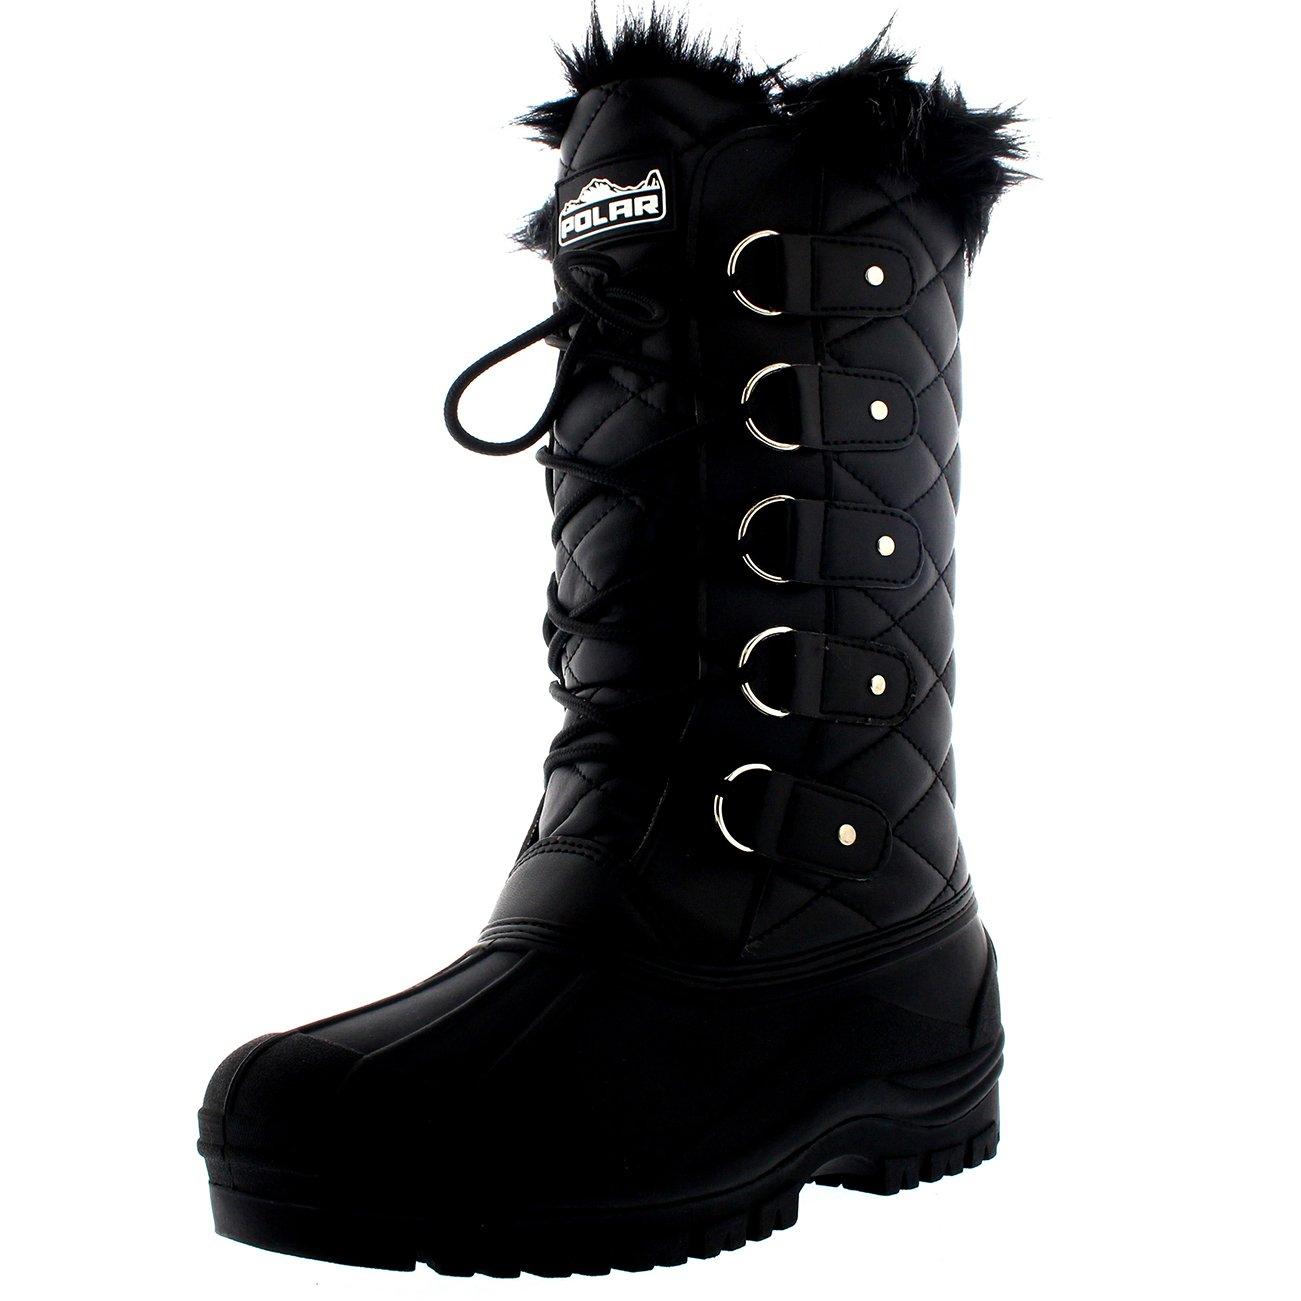 Black Waterproof Boots: Amazon.com